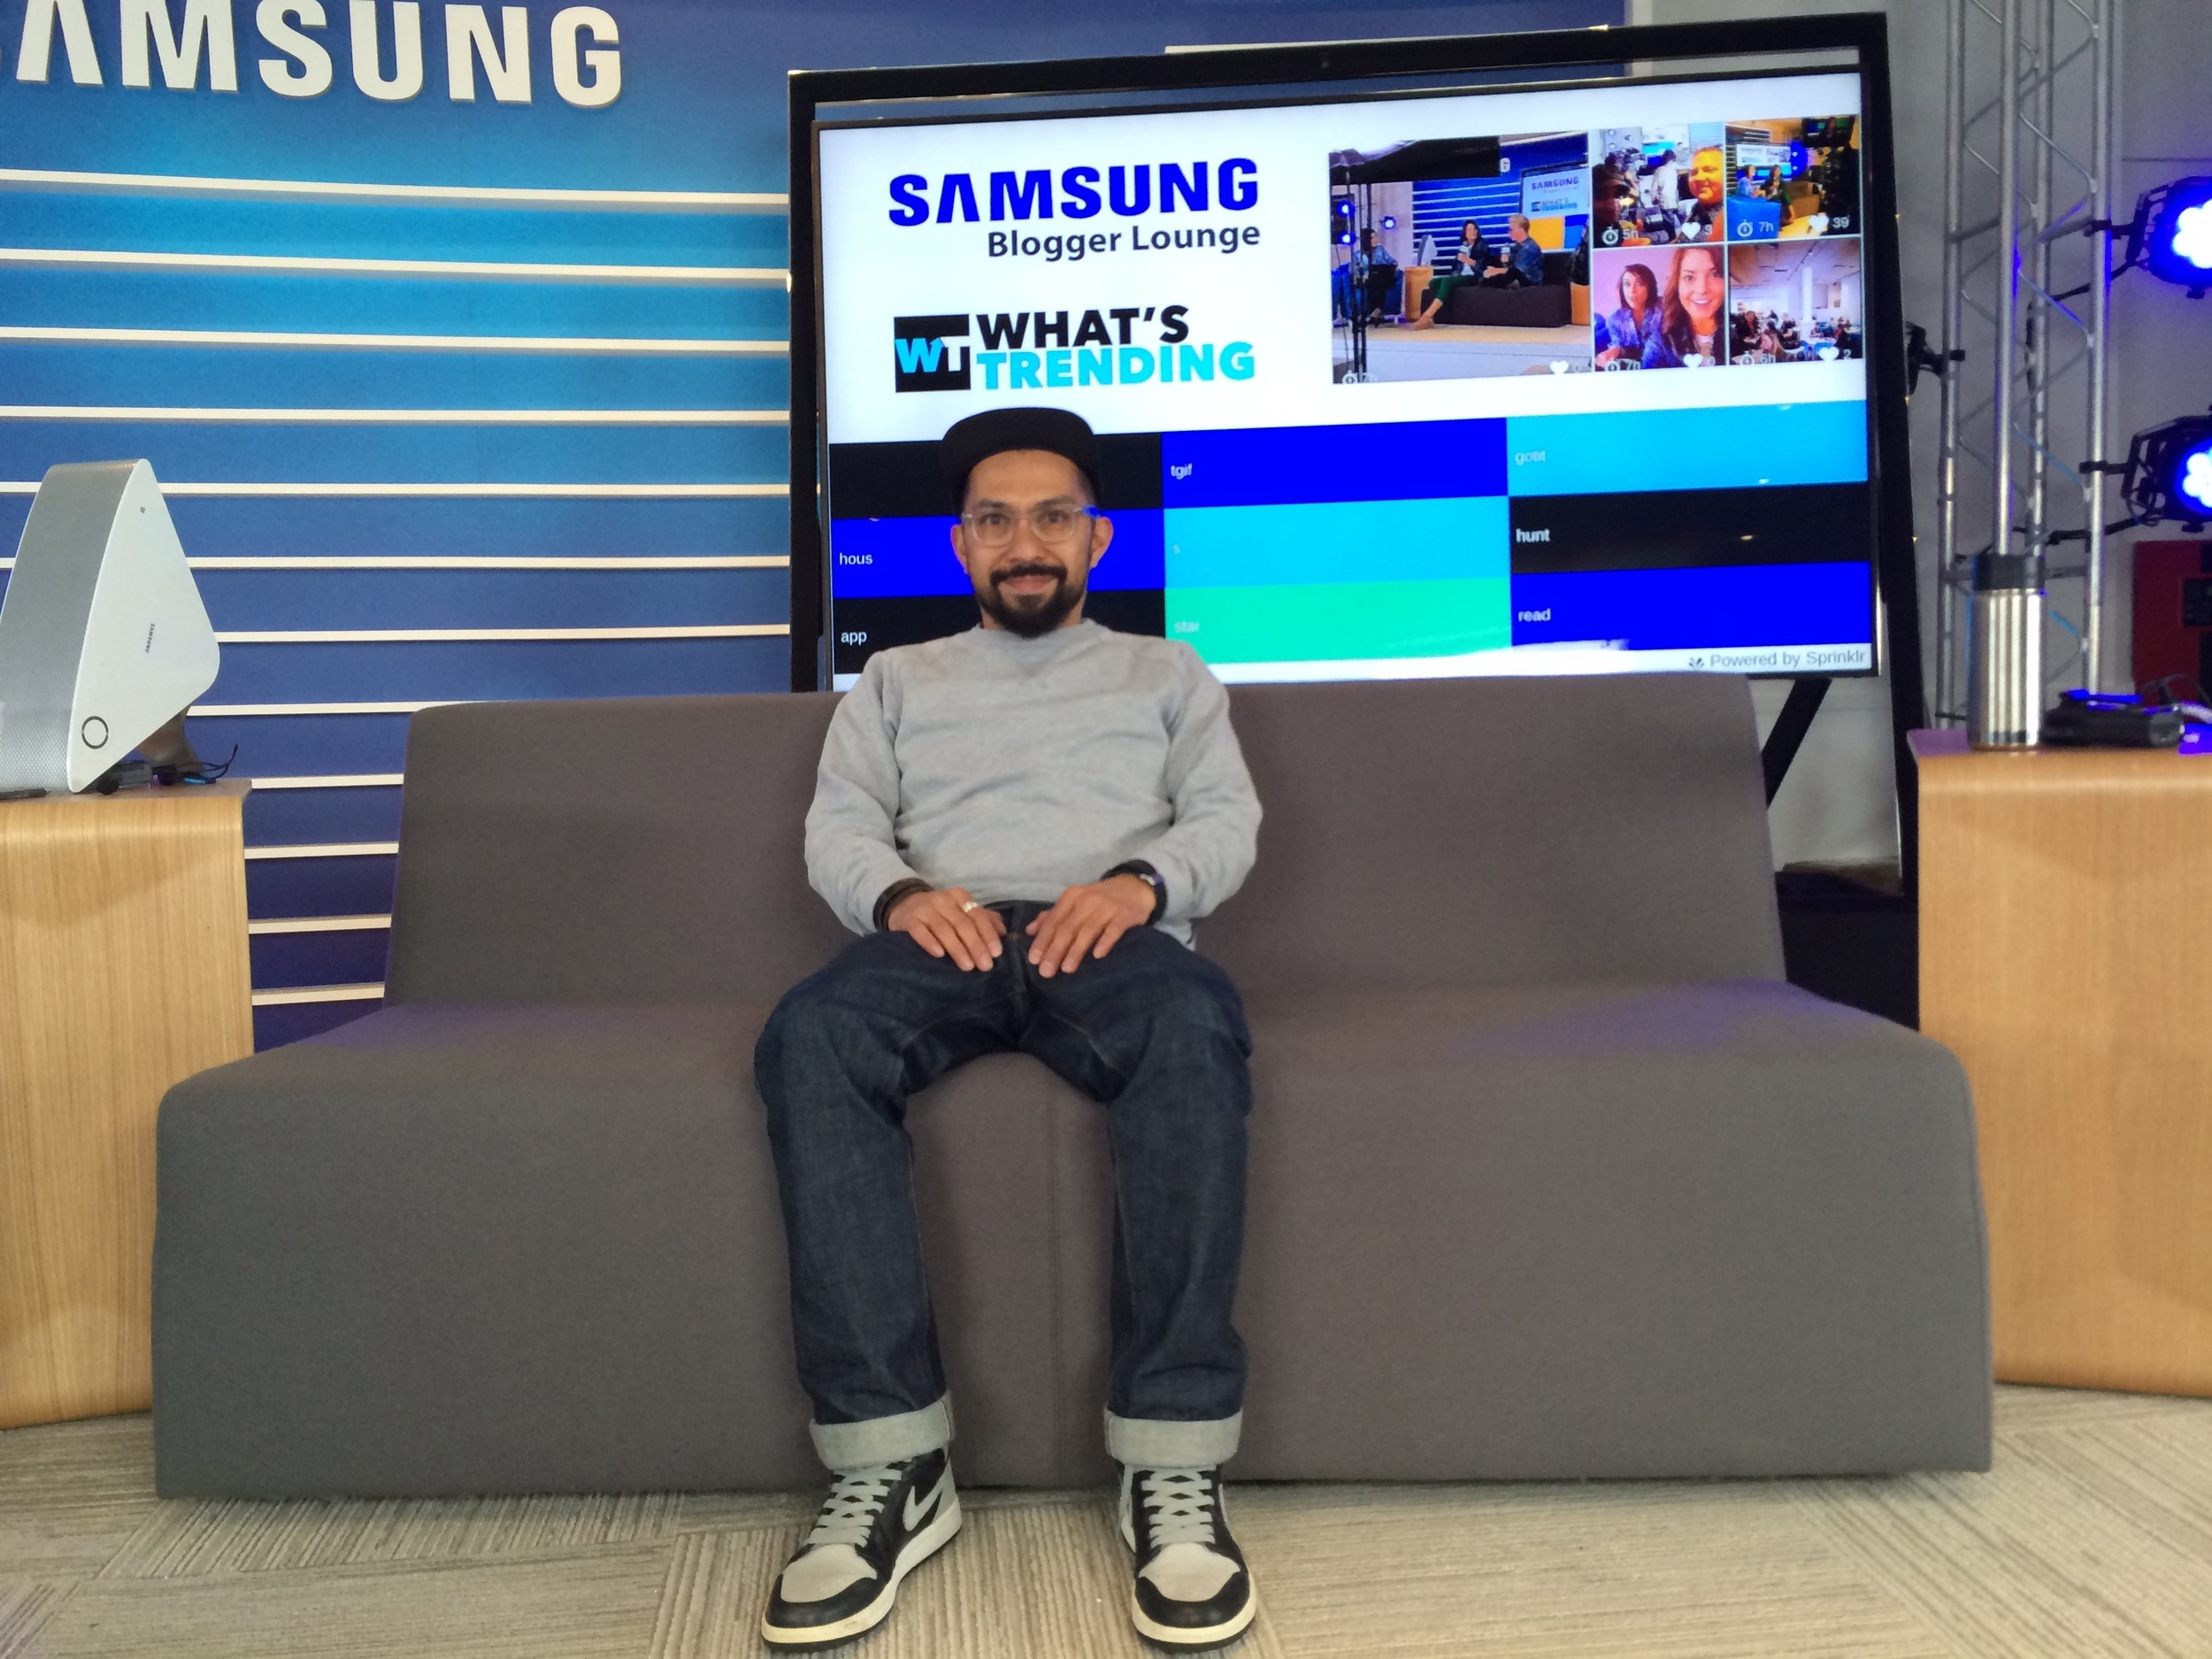 Samsung at SXSW 2014 - Austin